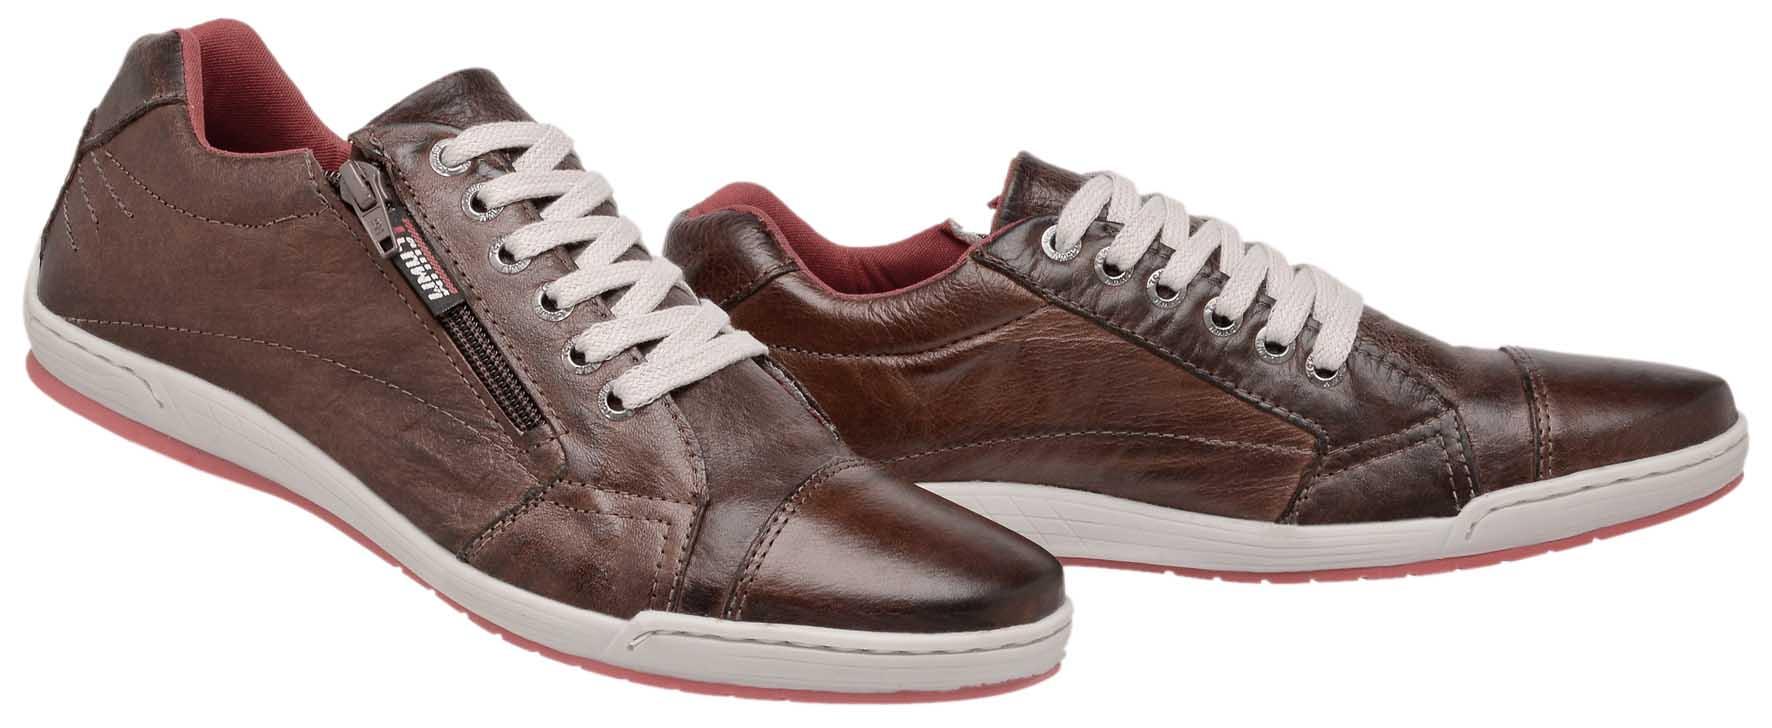 72a452650fb1e ... Sapatênis Zíper Stilo Tchwm Shoes Couro Fóssil - Marrom - Madrid Outlet